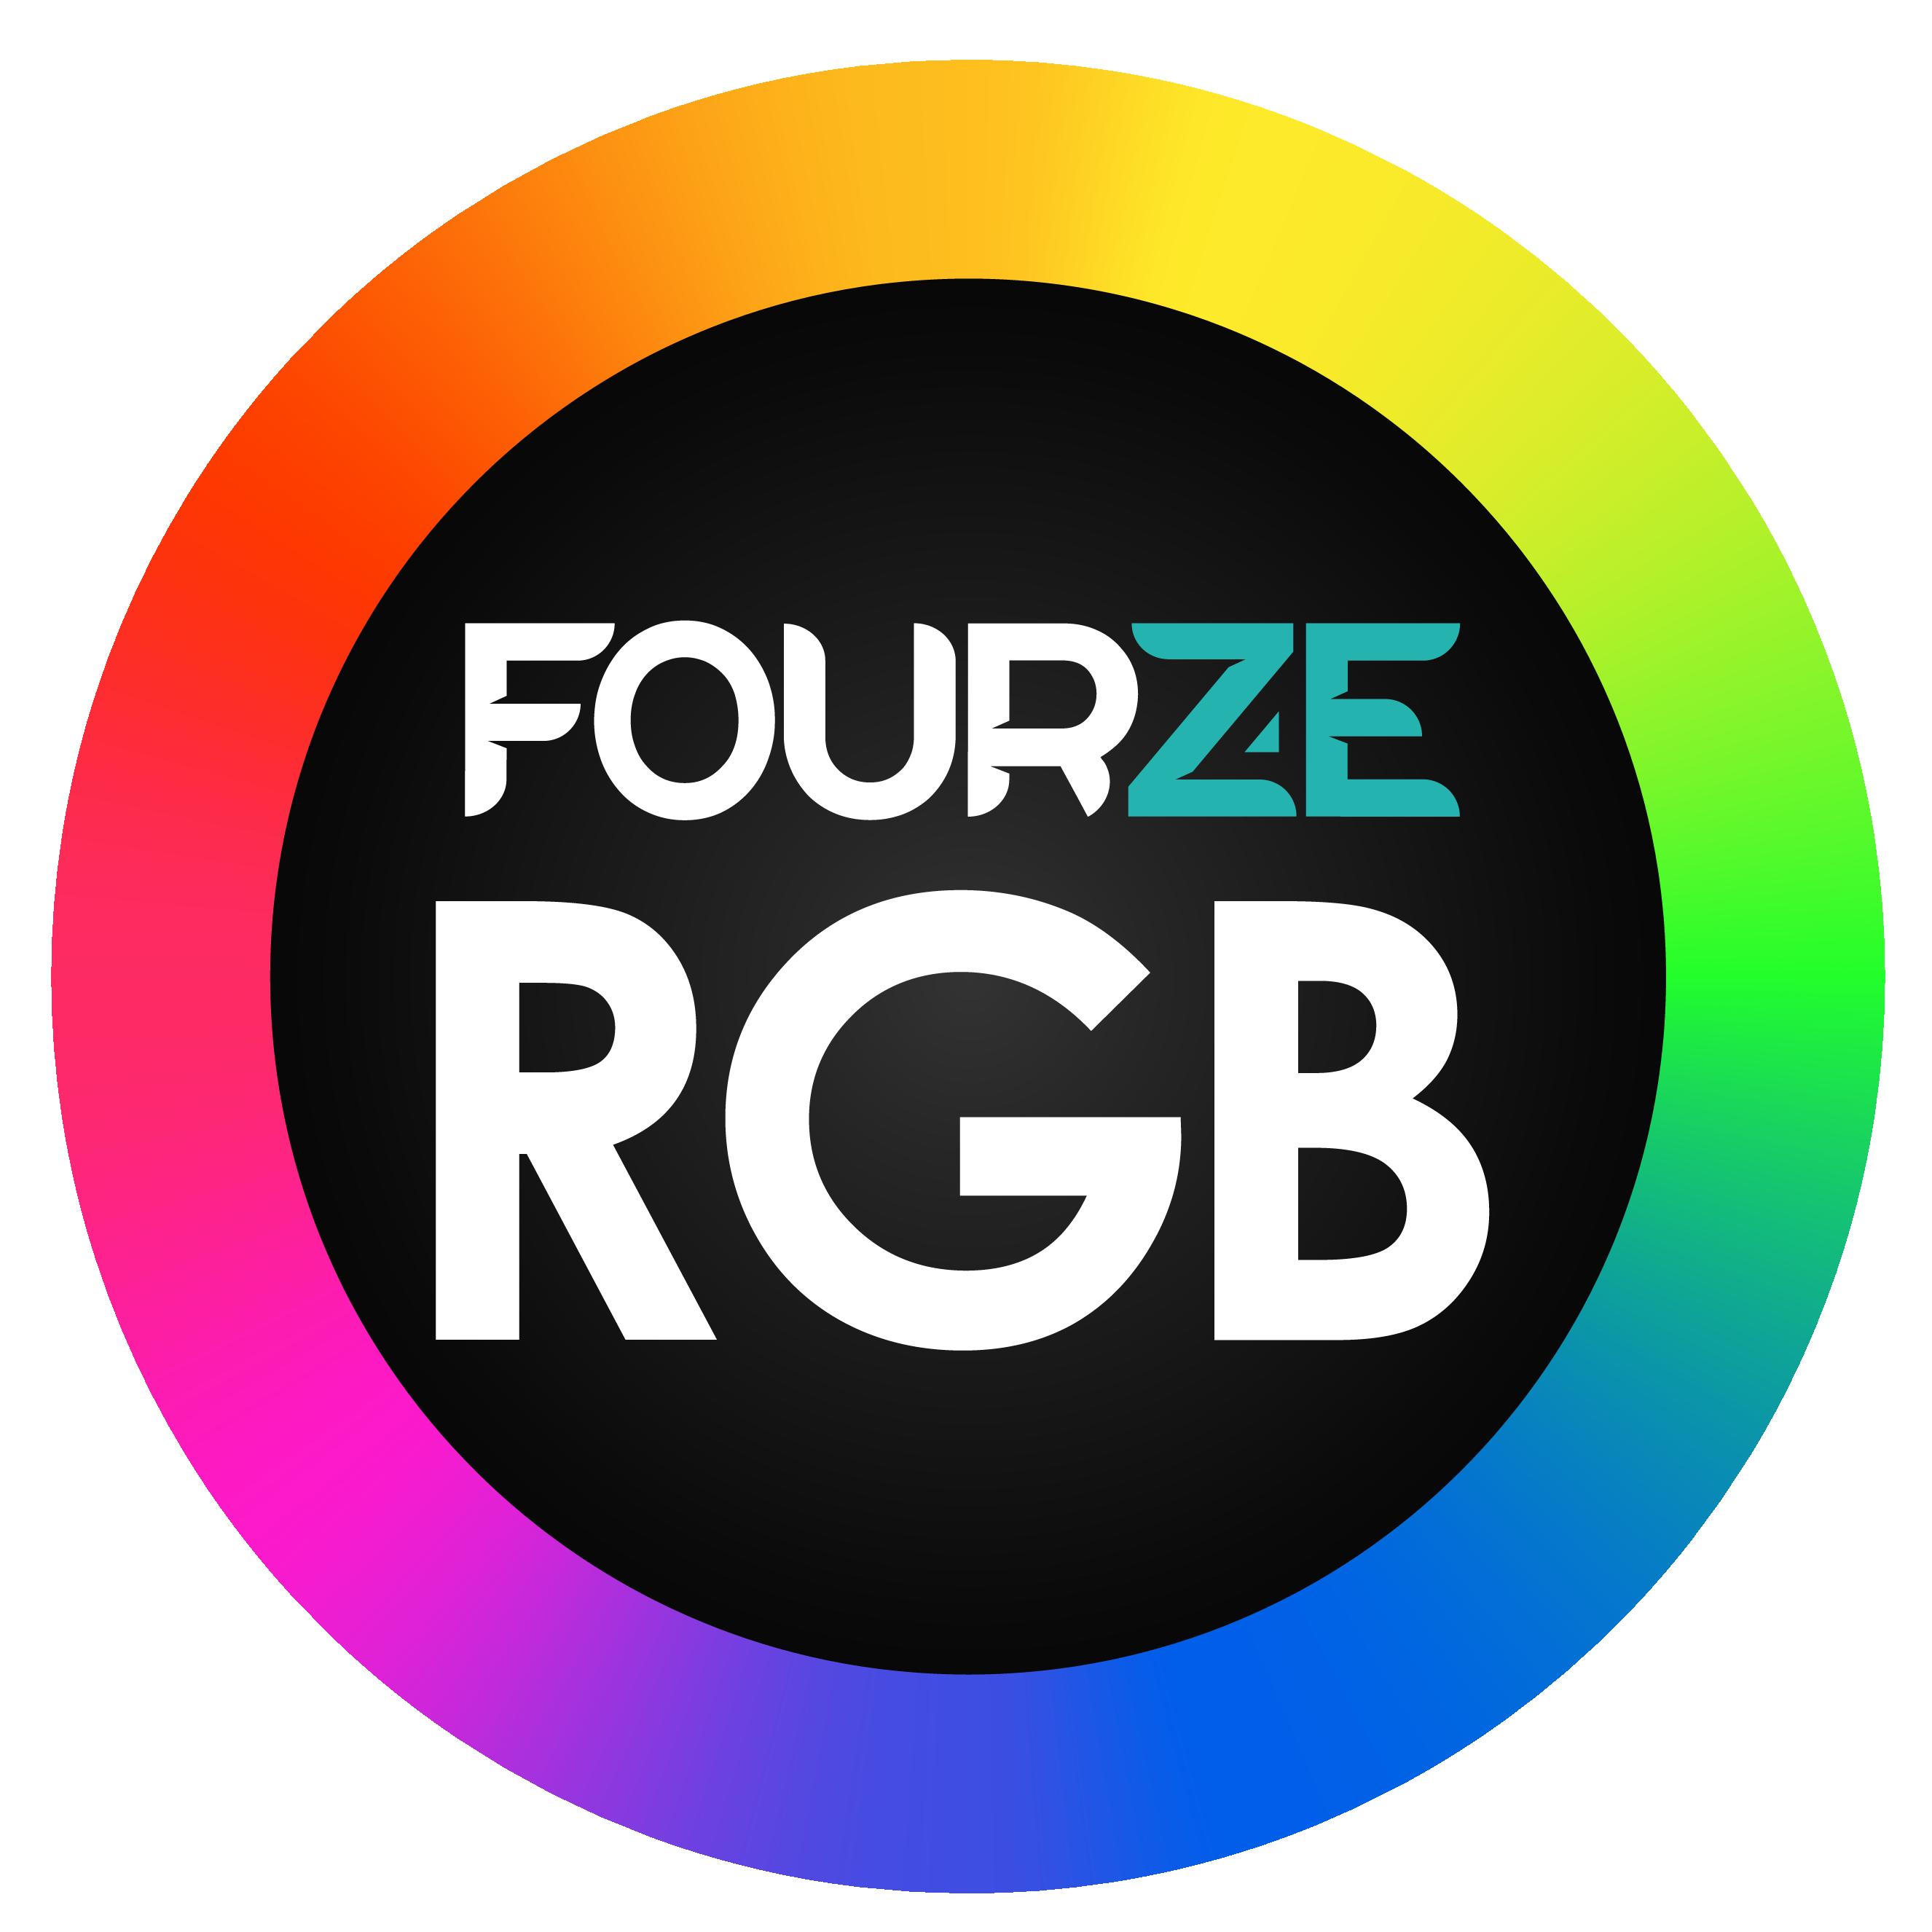 FOURZE GM800 Pelihiiri RGB - musta